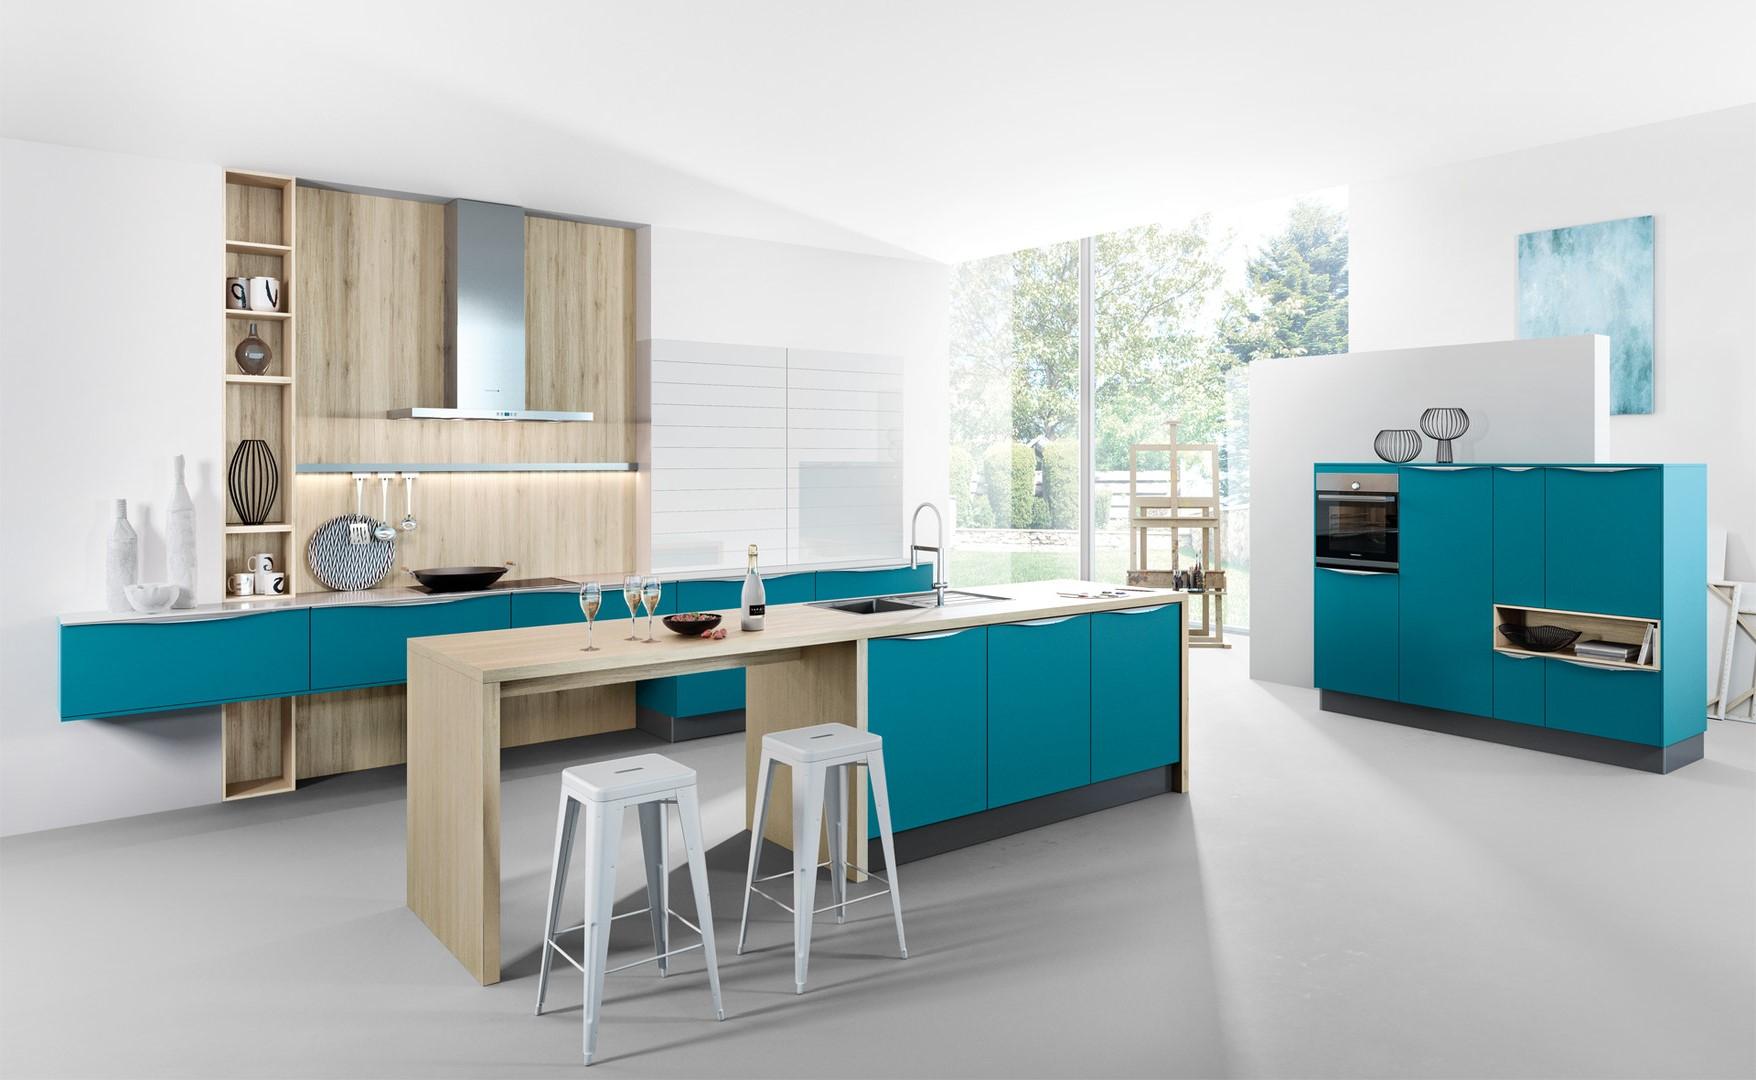 Armoires de cuisine bleu canard modernes.